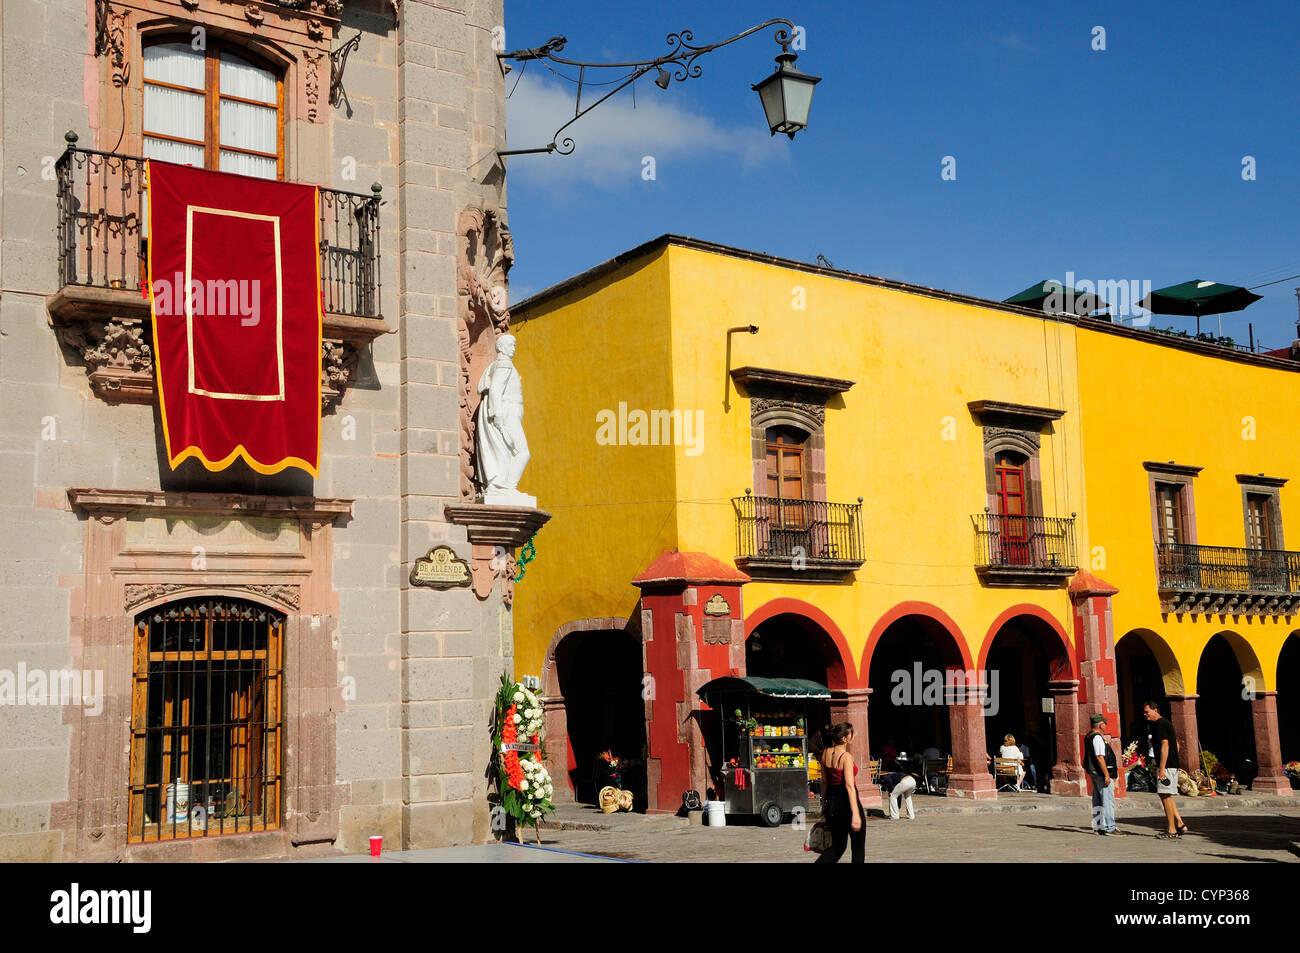 El Jardin Part view of Museo Casa de Allende and yellow painted arcades people and fruit juice vendor   Hispanic - Stock Image